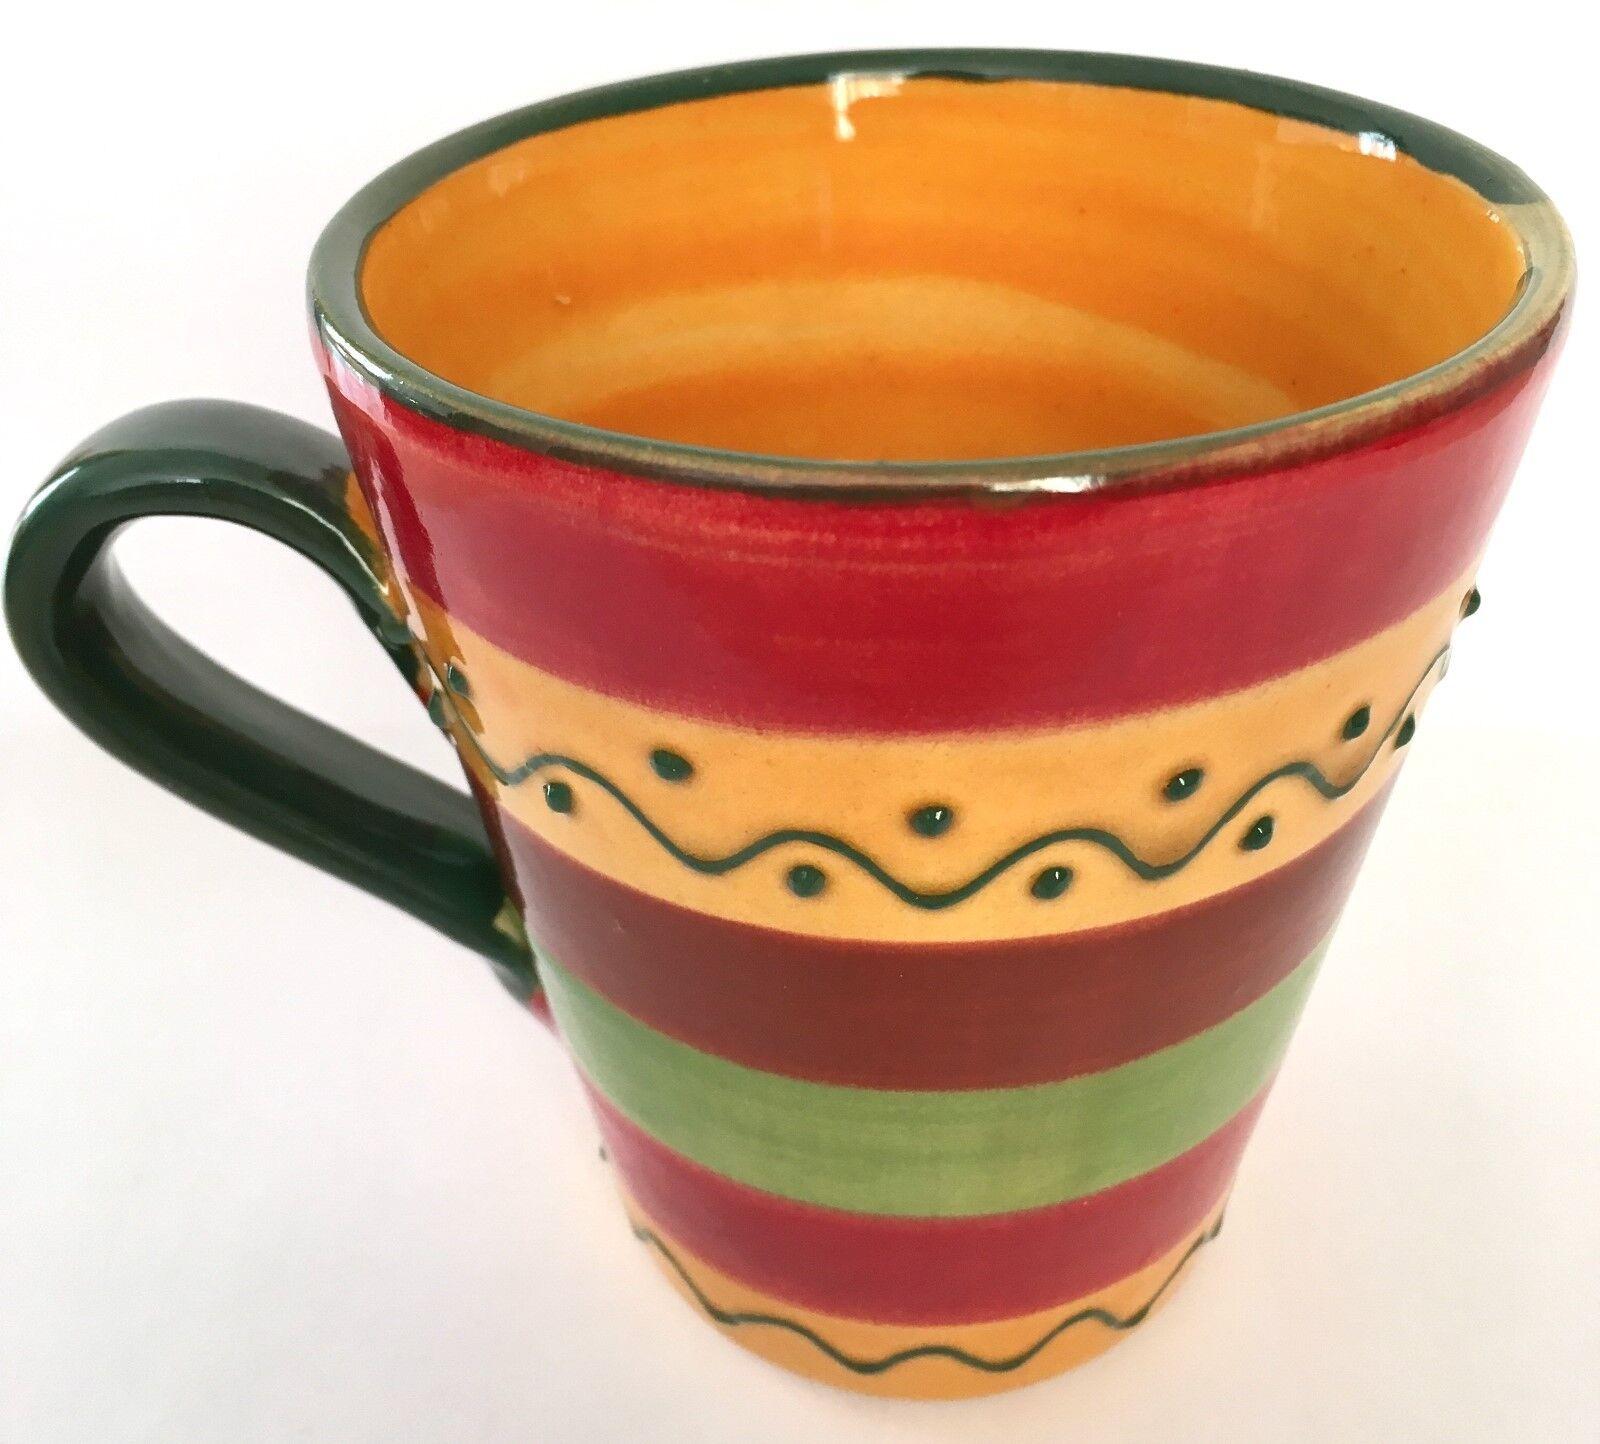 Tasse, Kaffeebecher, spanische Keramik, versch. Farben/Muster, Handarbeit